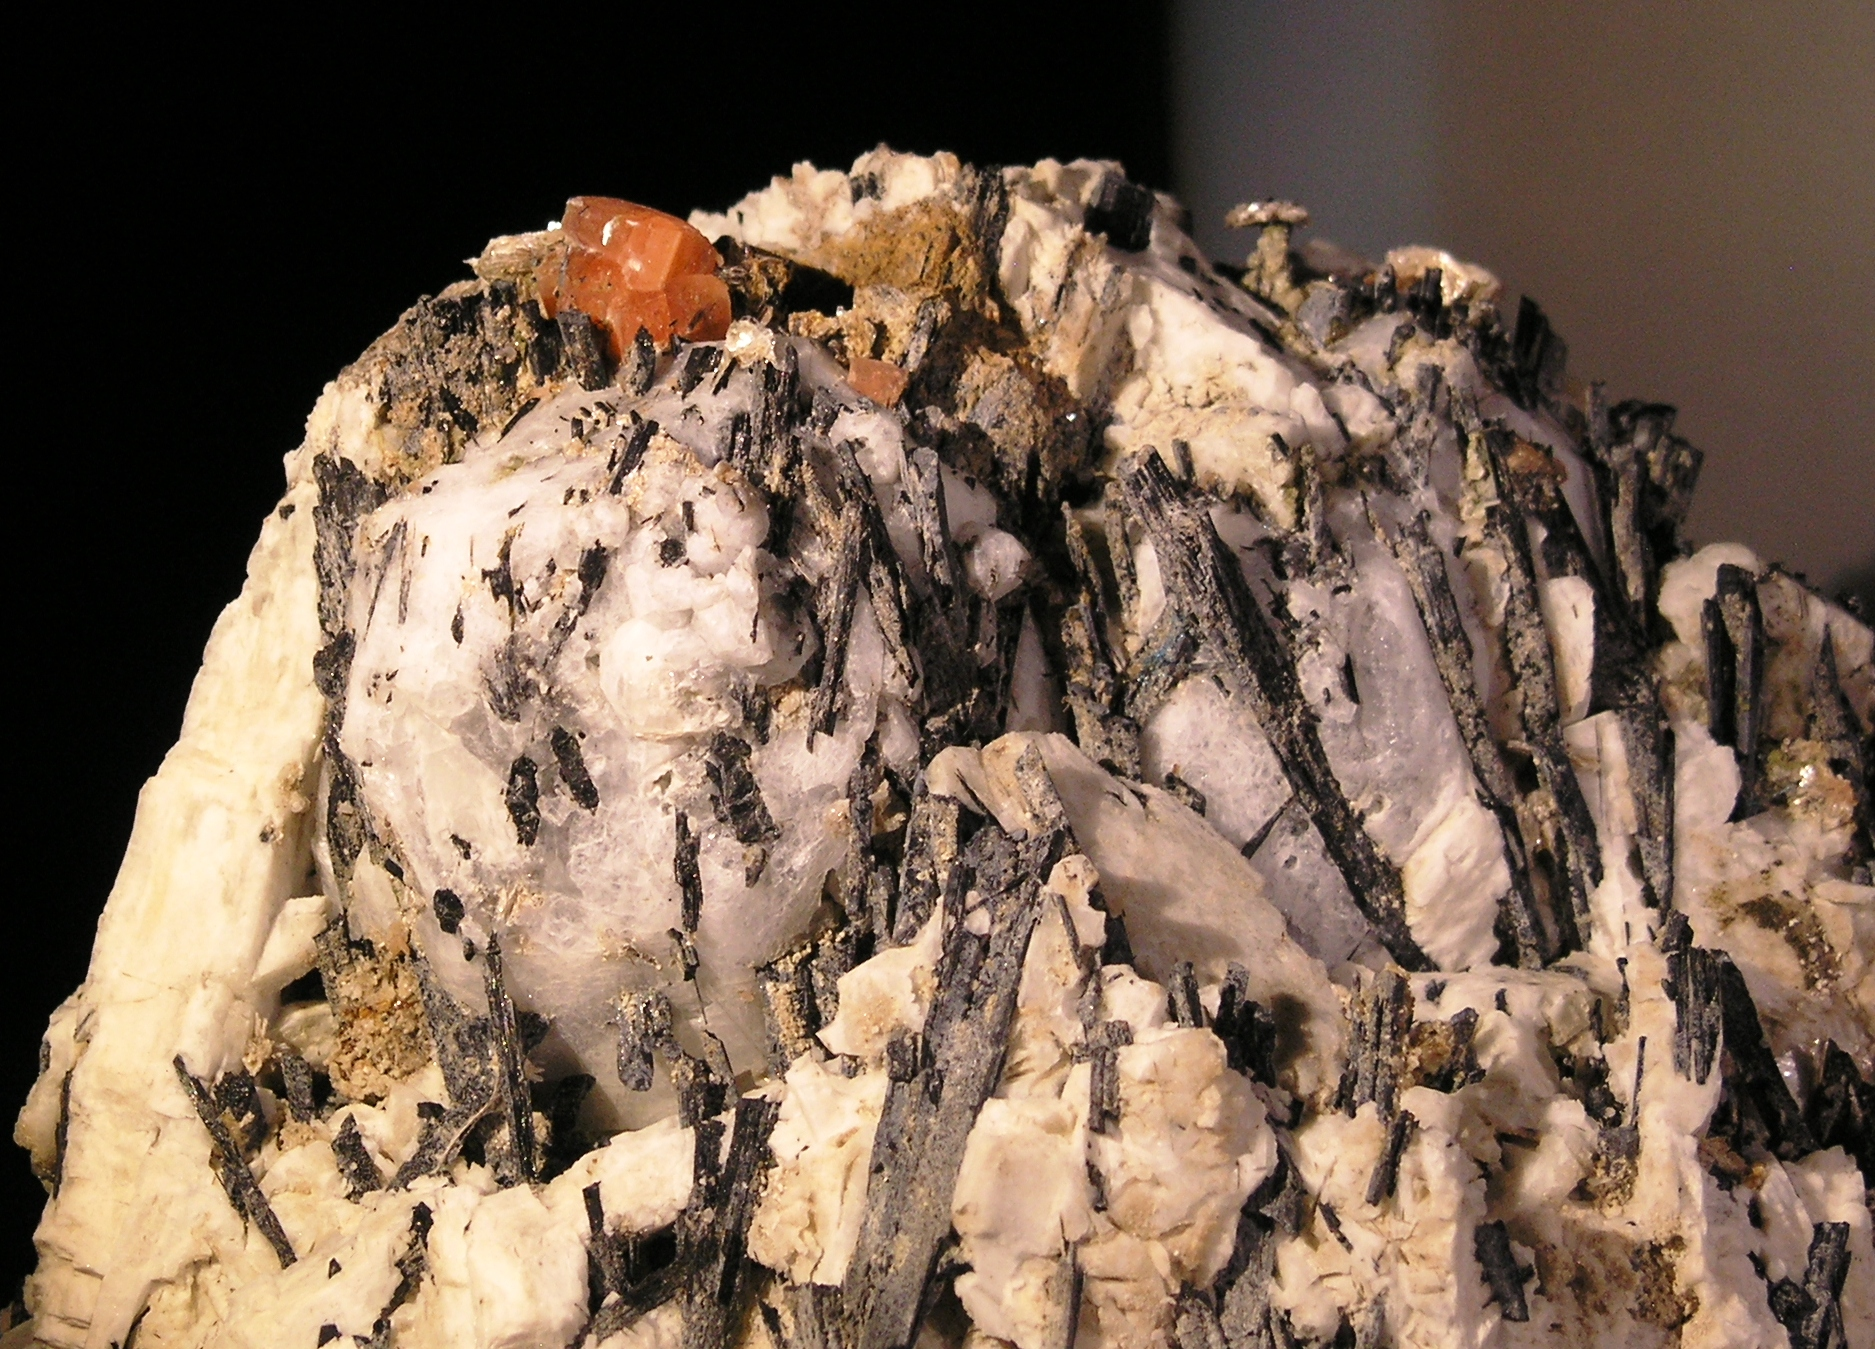 Serandite Analcime fine mineral specimen -001